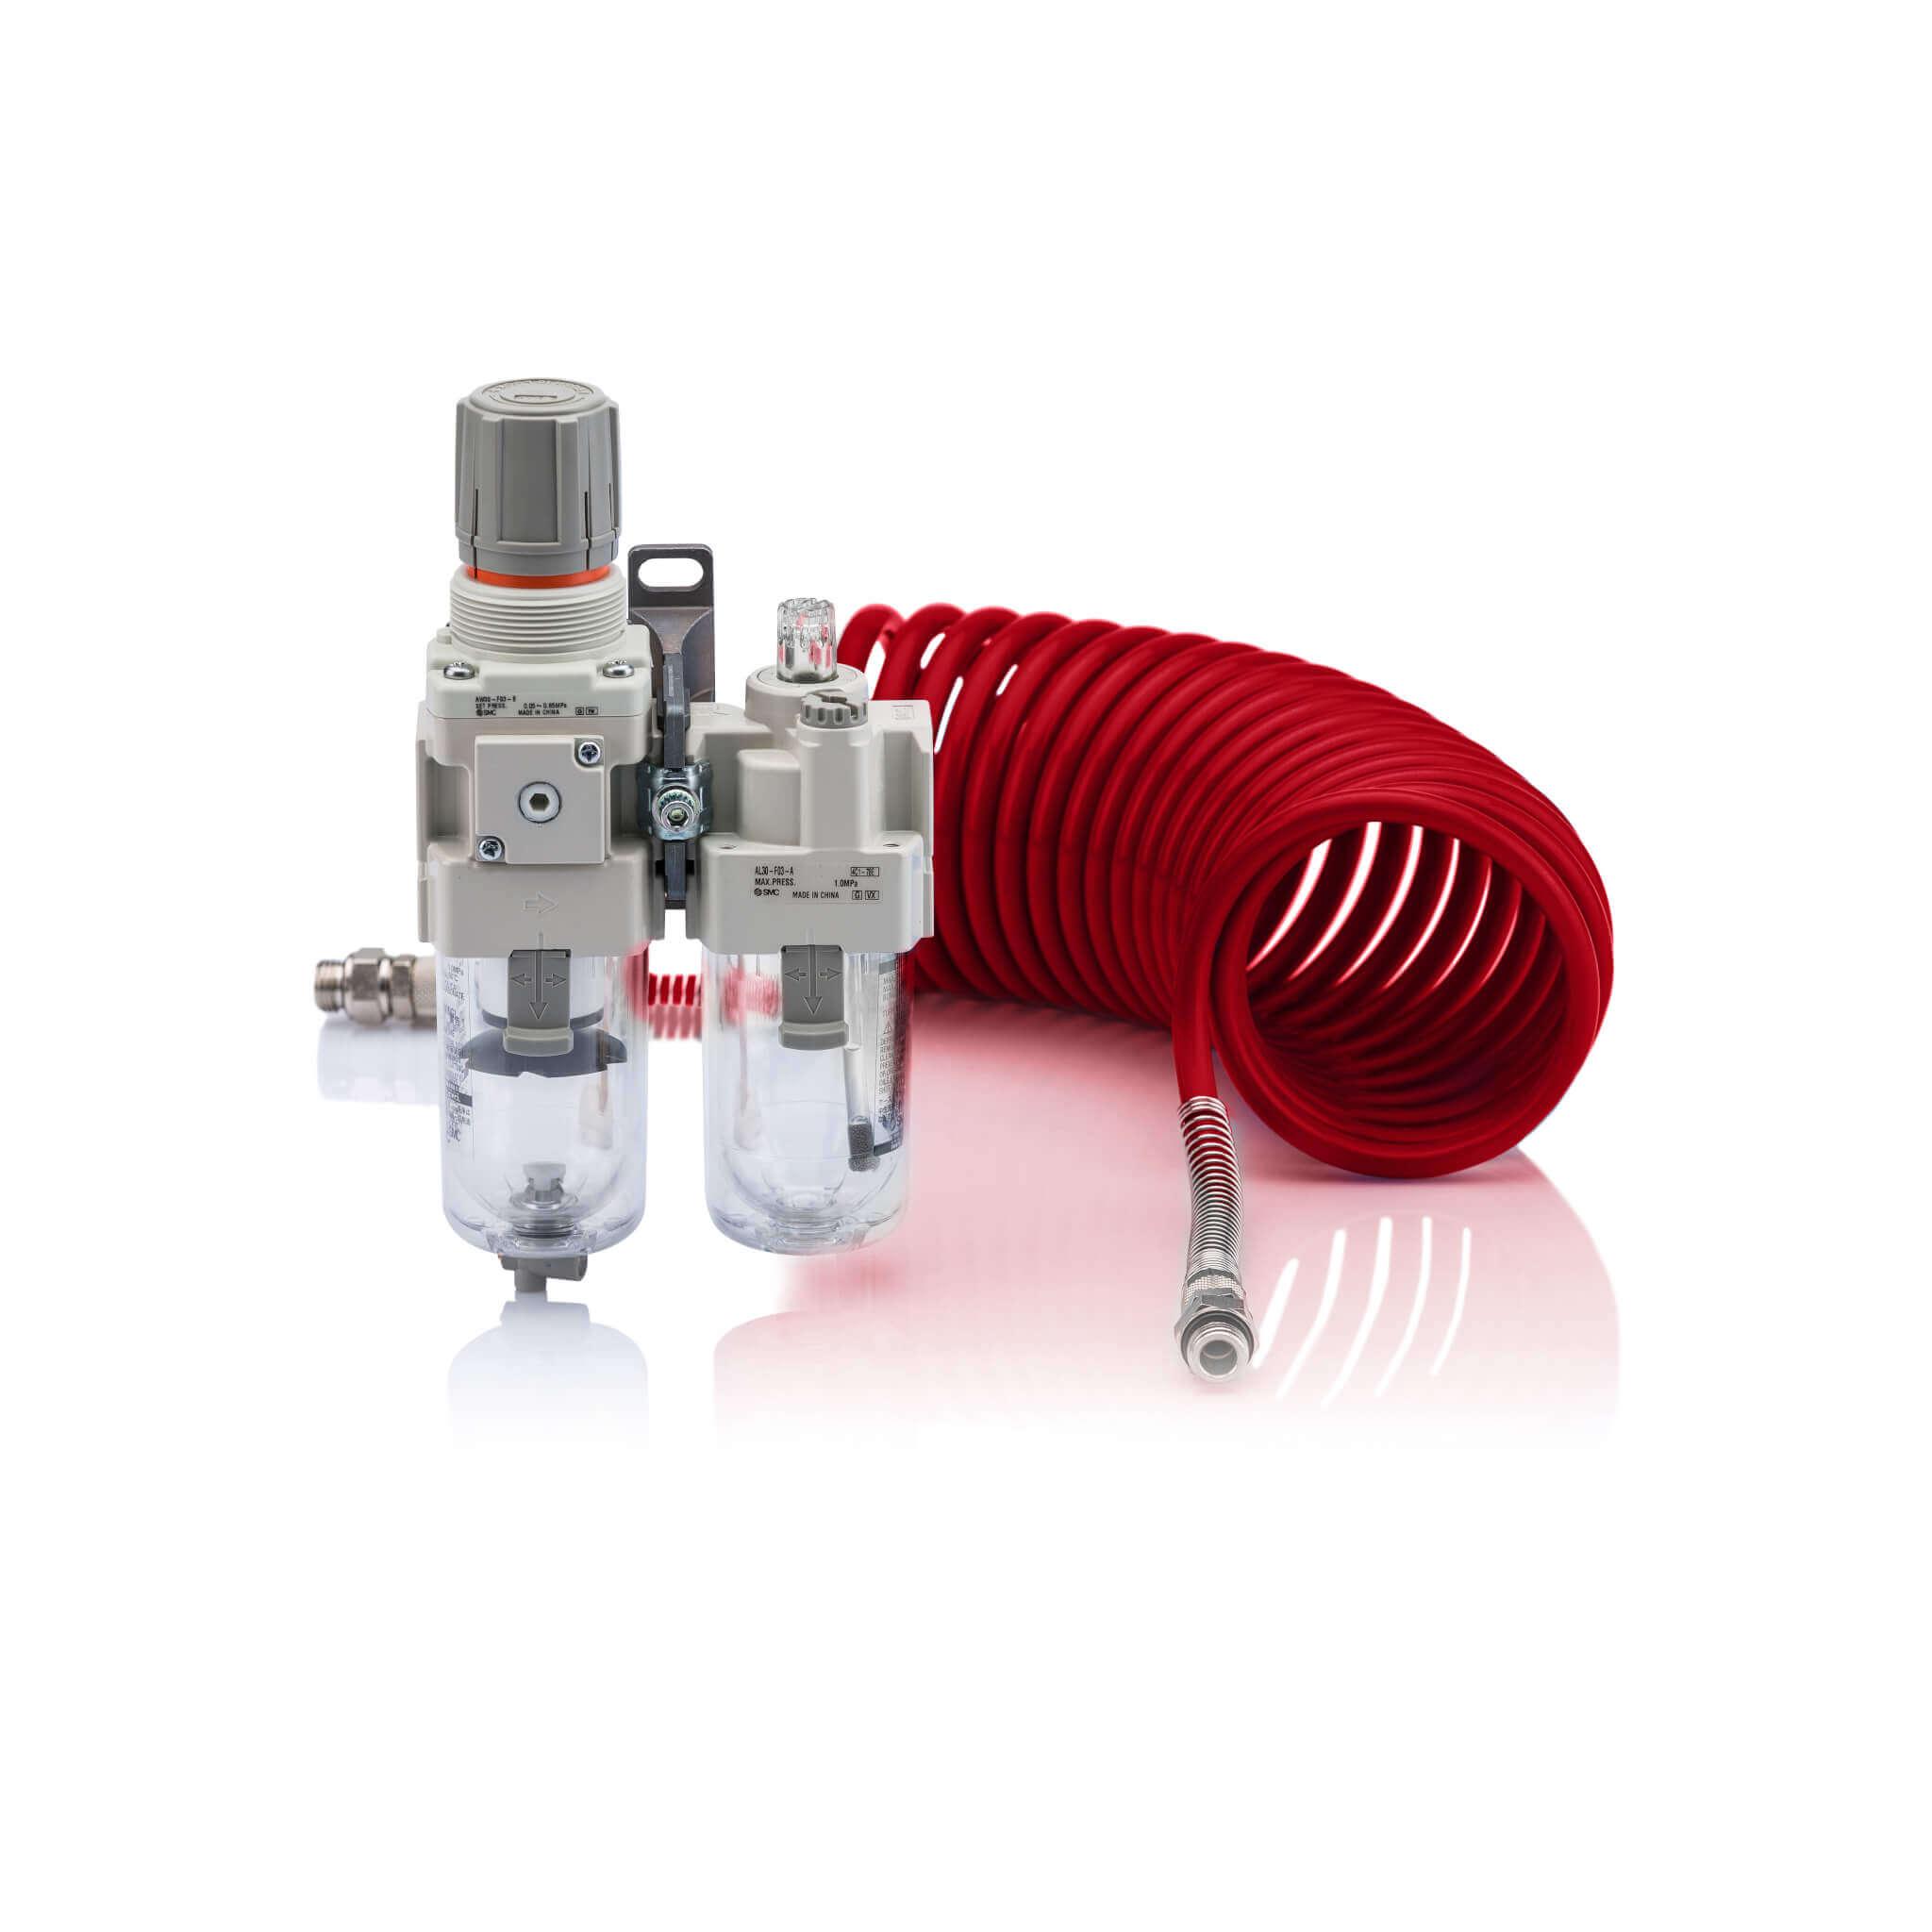 Komponente za pnevmatiko ali pnevmatske komponente